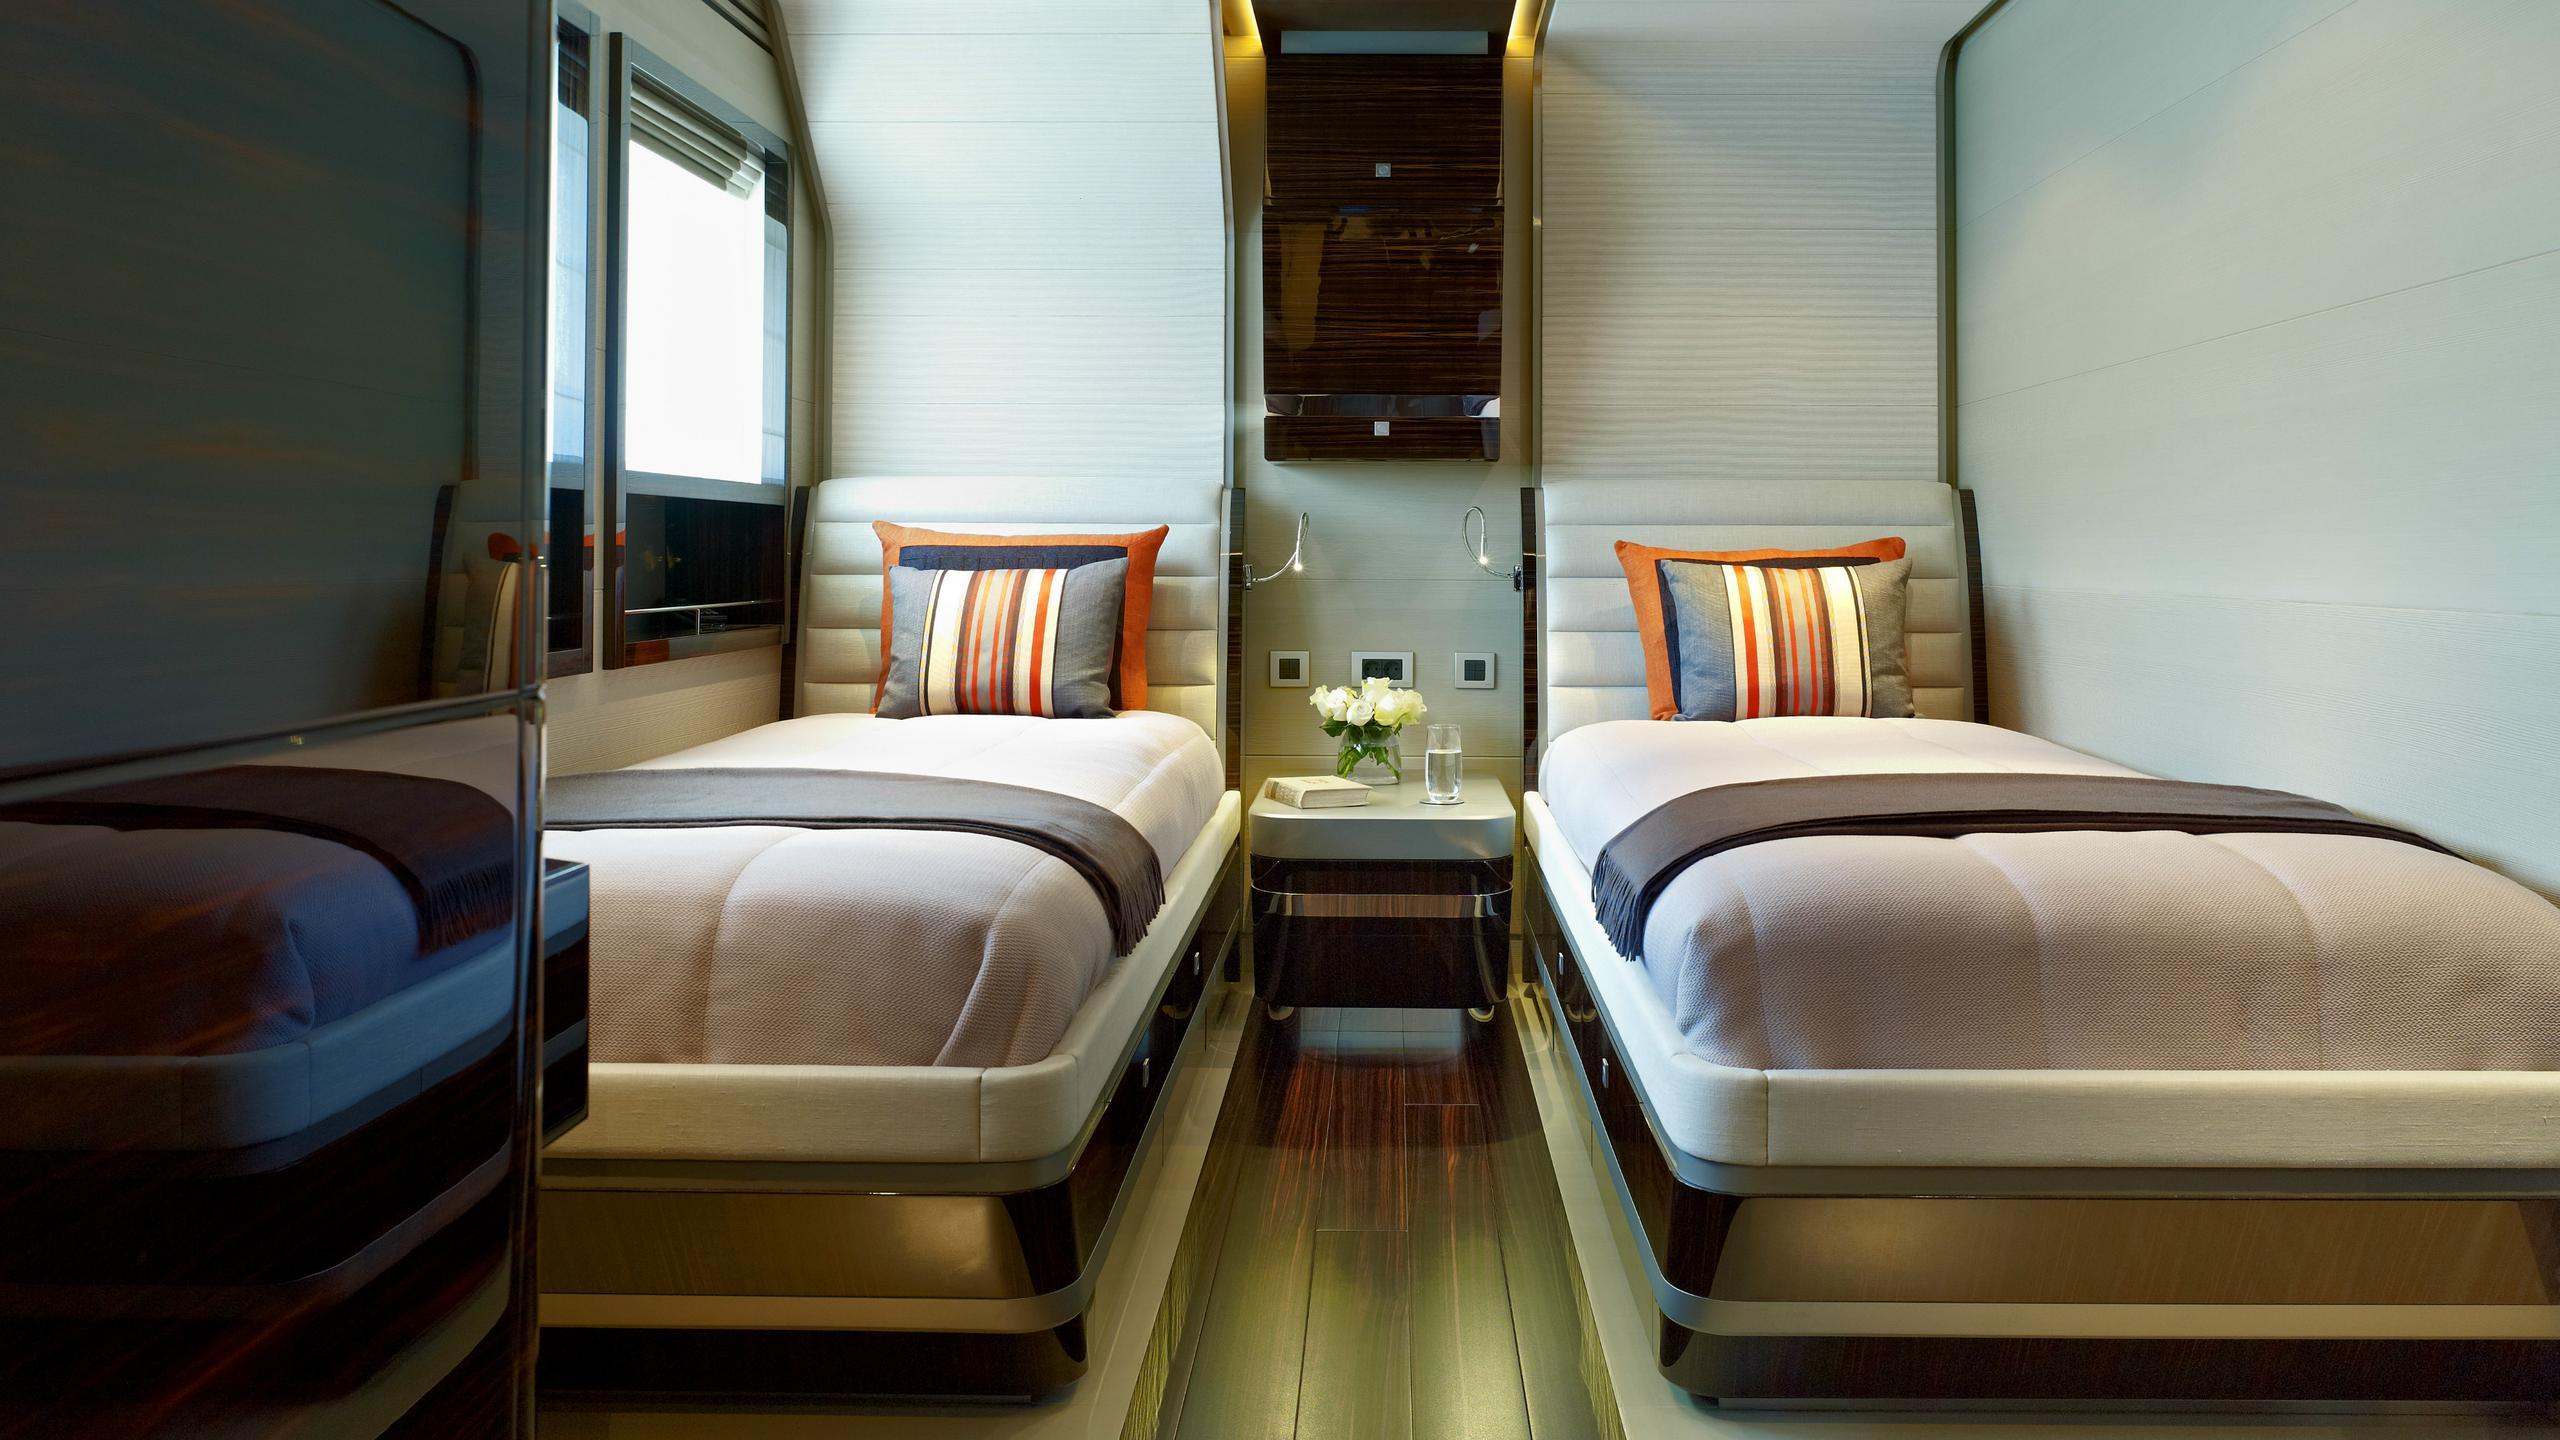 odyssea-como-lady-petra-motor-yacht-heesen-2012-47m-twin-room